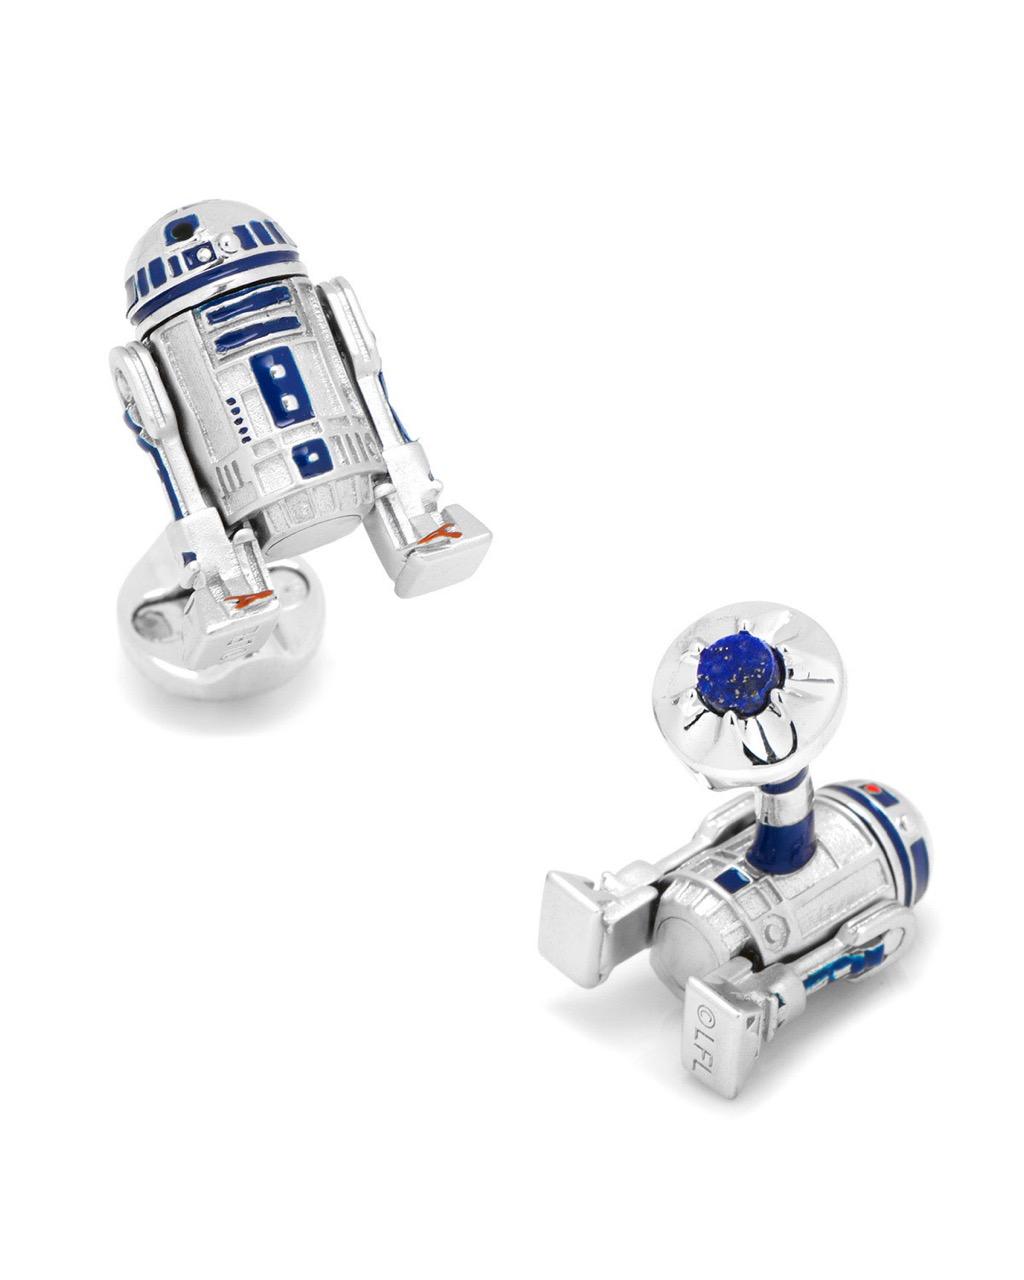 Star Wars Cufflinks Best Birthday Gifts for Your Husband